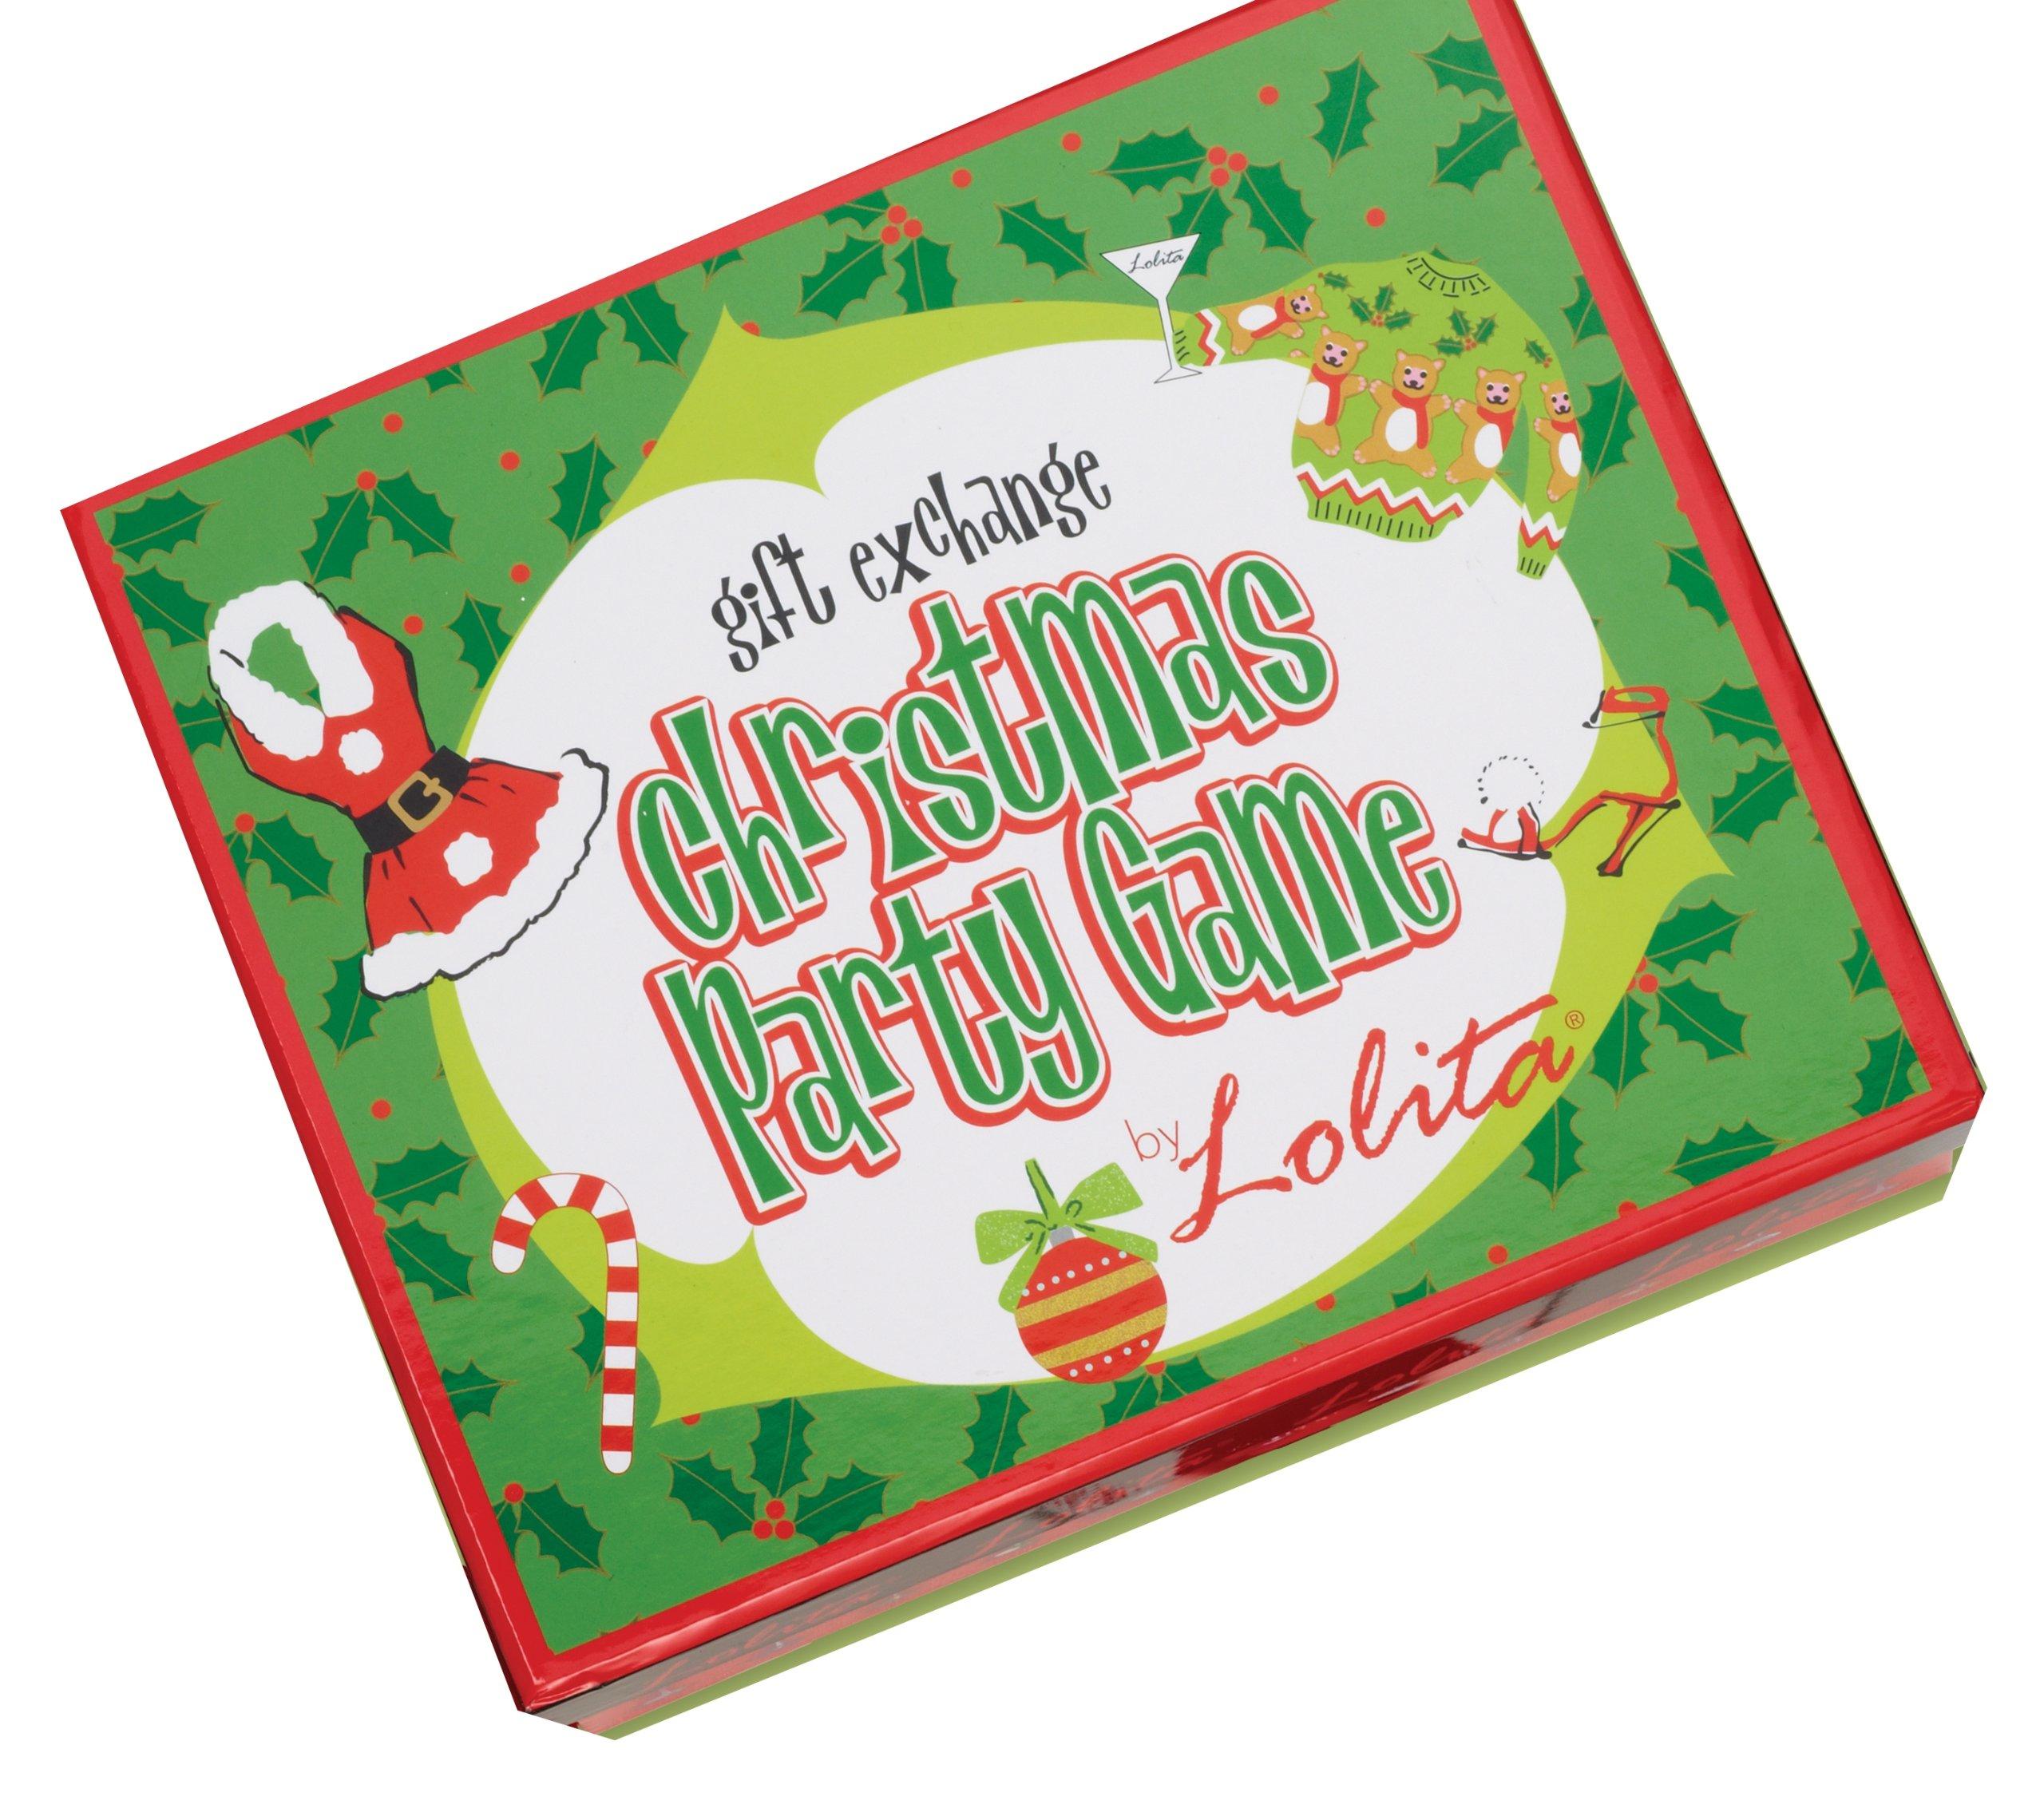 CR Gibson Lolita Christmas Gift Exchange Party Game